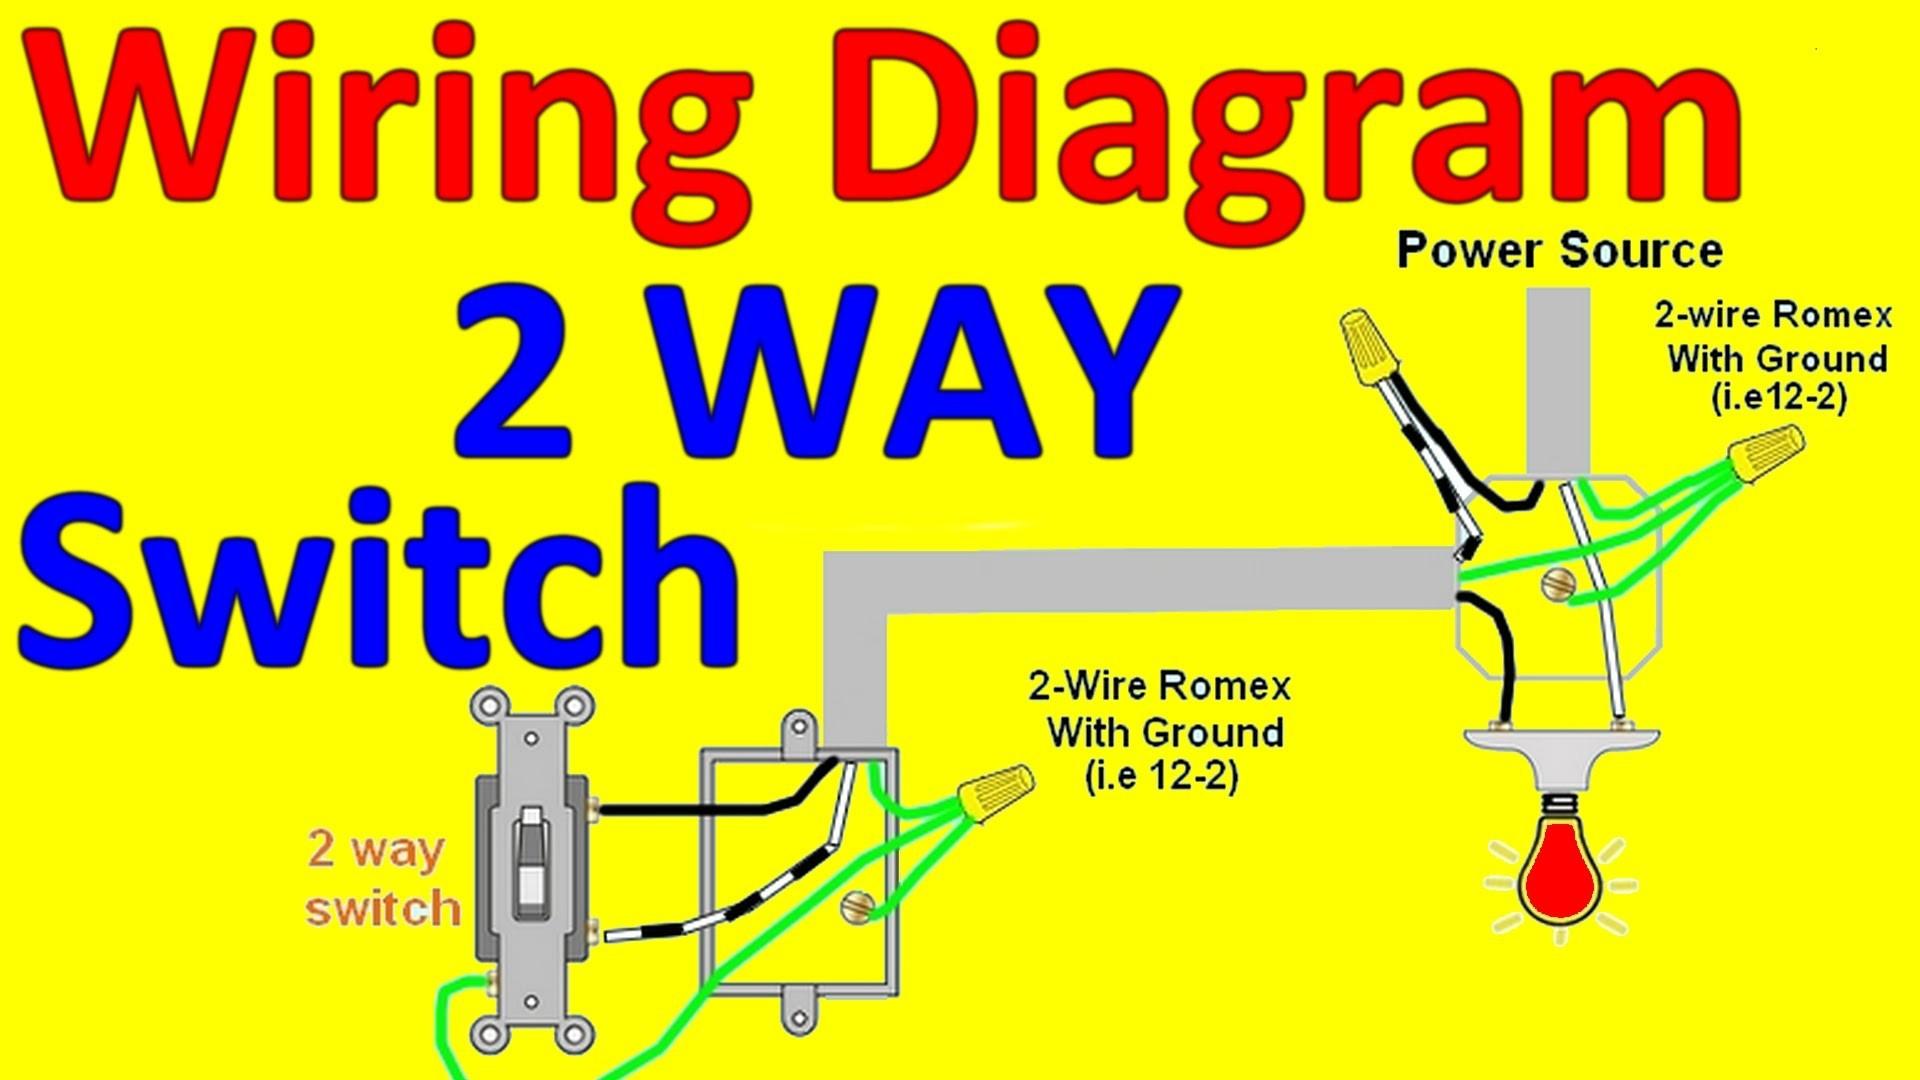 Headlight Switch Wiring Diagram 2 Way Light Switch Wiring Diagrams Beautiful Two Diagram Afif Of Headlight Switch Wiring Diagram